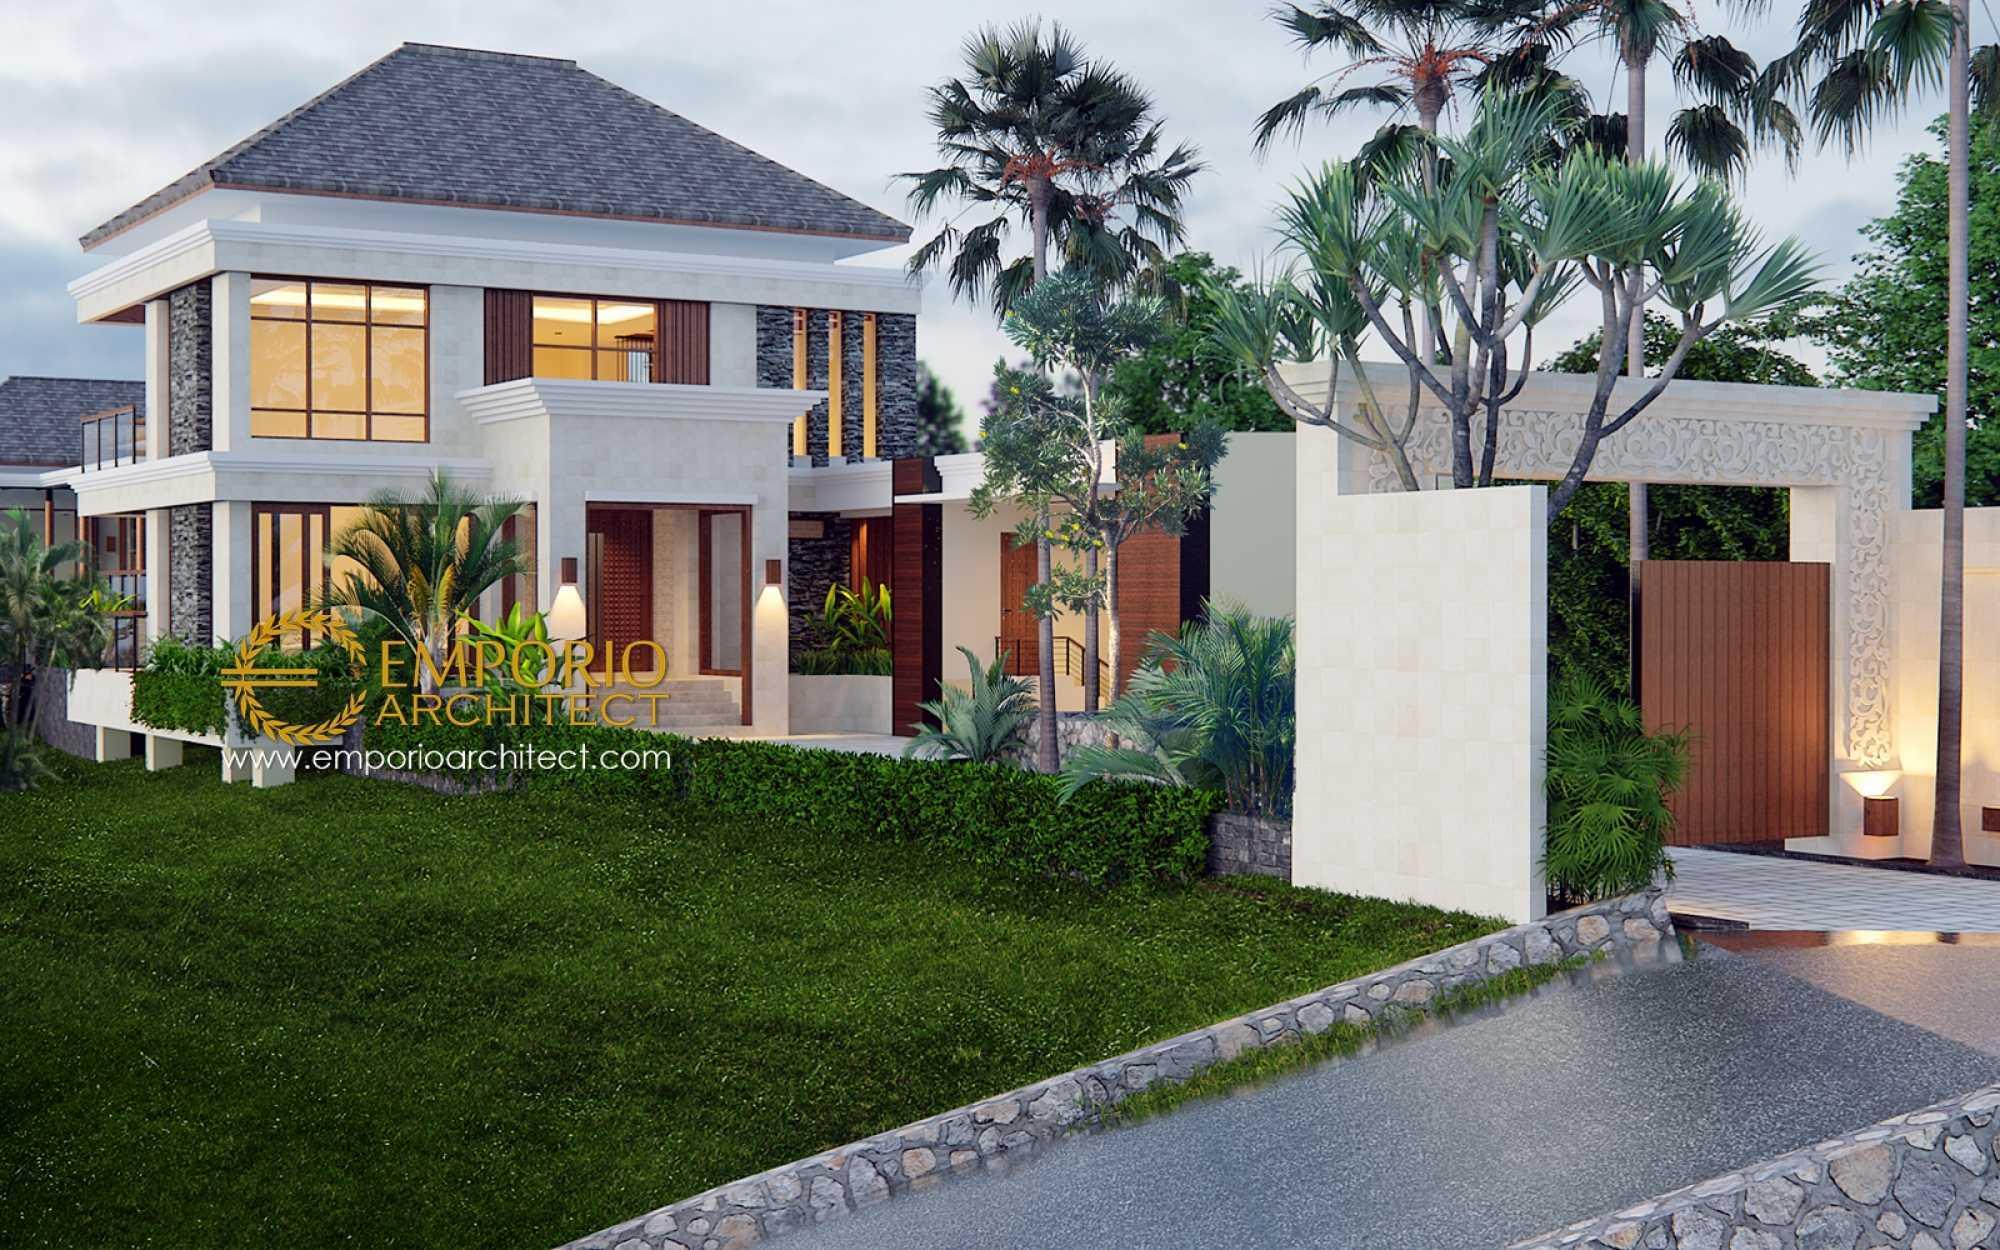 Emporio Architect Desain Rumah Villa Bali Tropis @ Bandung Bandung, Kota Bandung, Jawa Barat, Indonesia Bandung, Kota Bandung, Jawa Barat, Indonesia Emporio-Architect-Desain-Rumah-Villa-Bali-Tropis-Bandung Tropical  76595